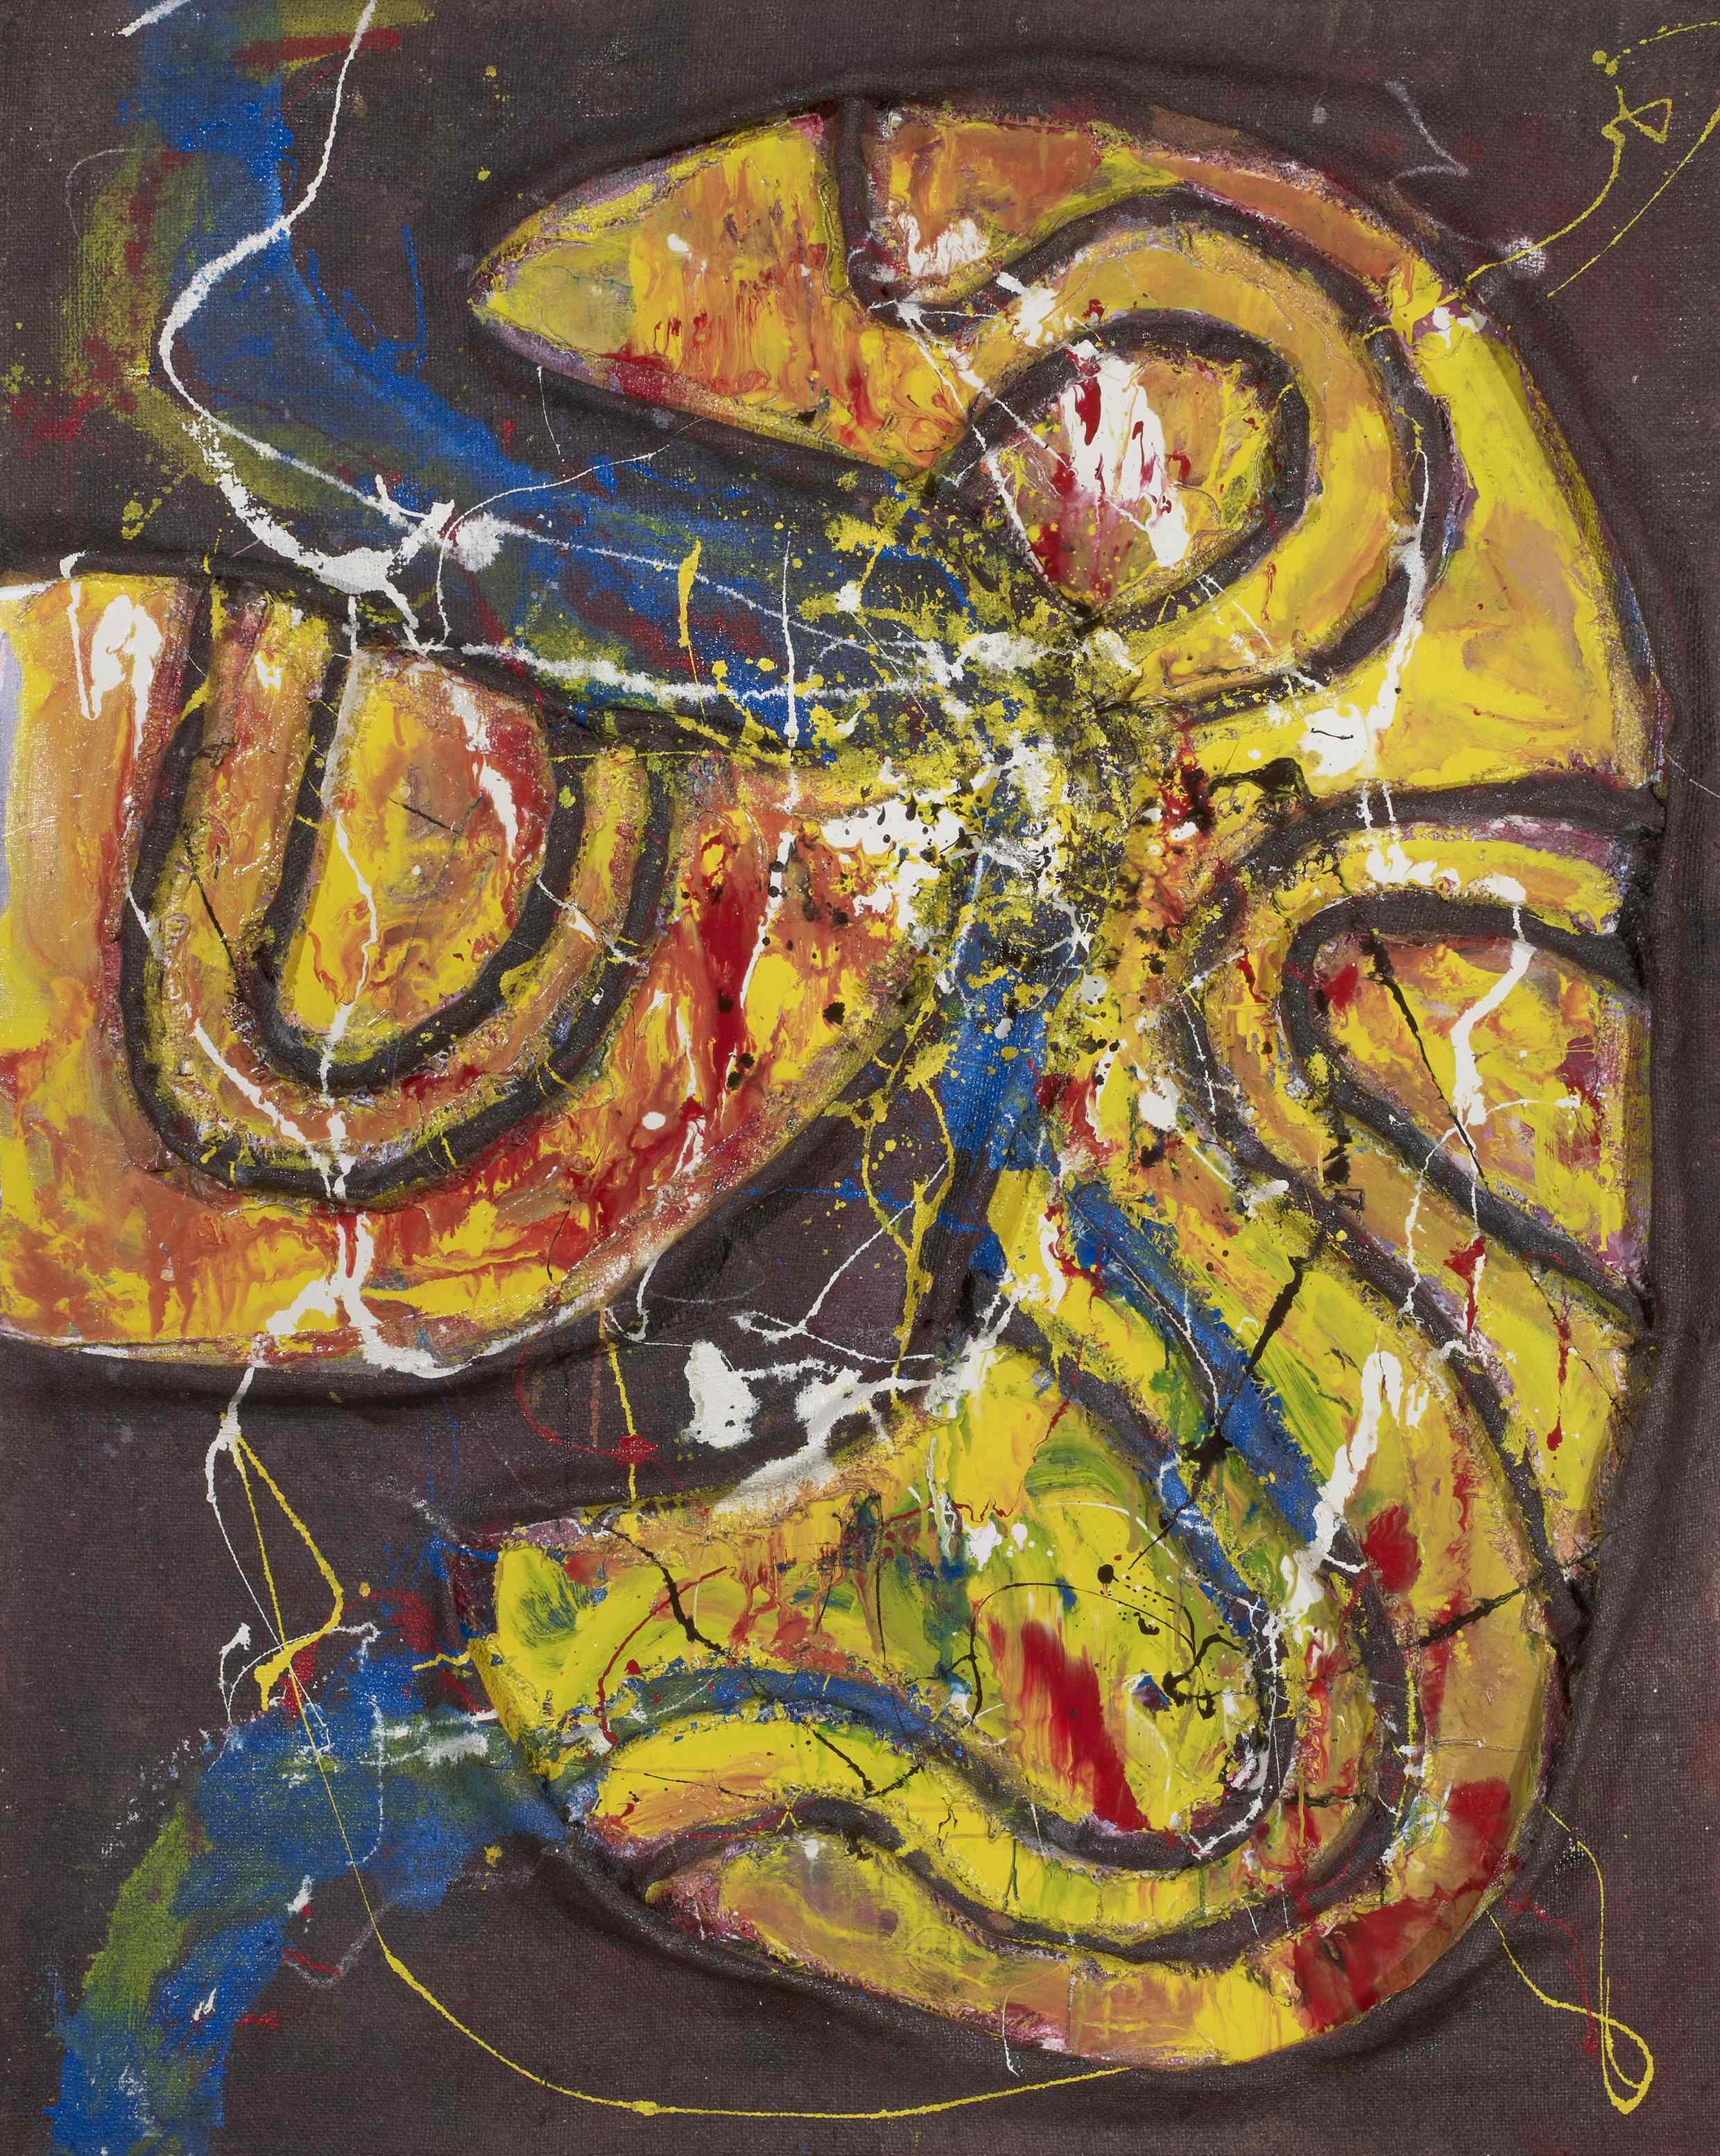 Tsuyoshi MAEKAWA, Untitled 141262, 2014 - 165x133.6cm (100F)_bd